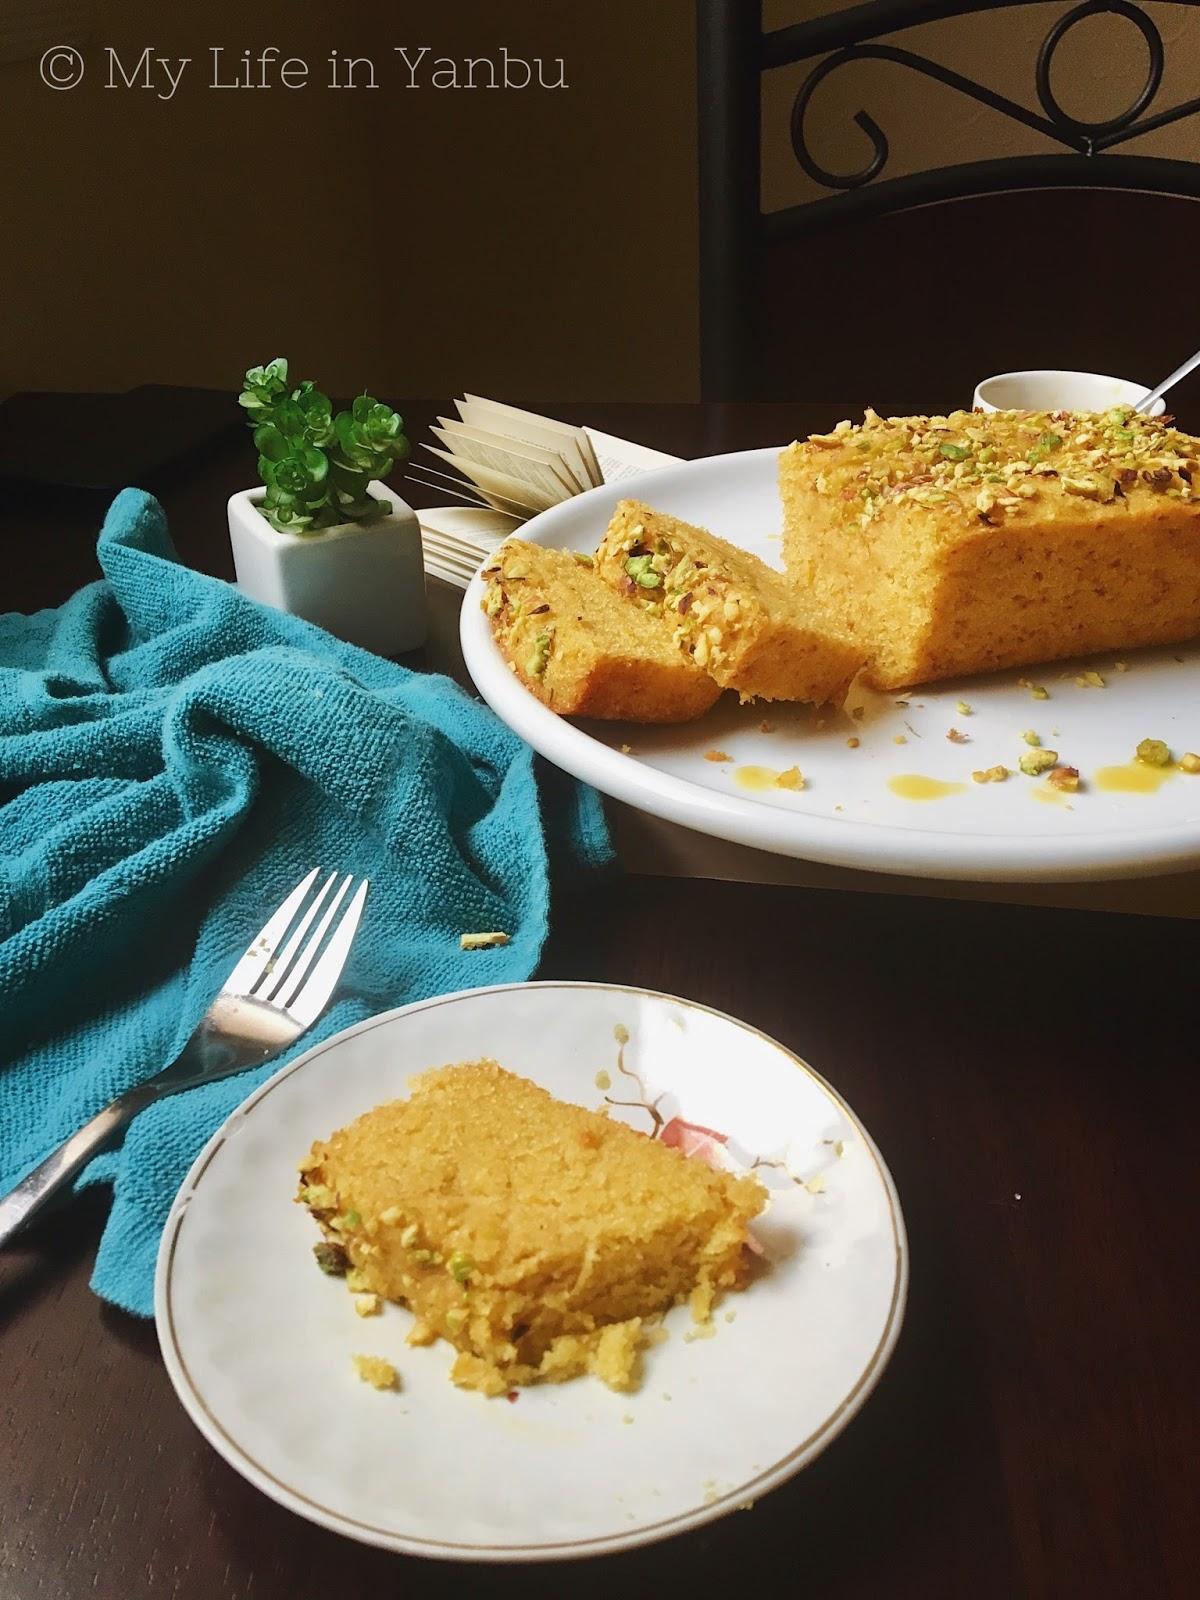 My Life in Yanbu!: Mango Semolina Eggless Cake